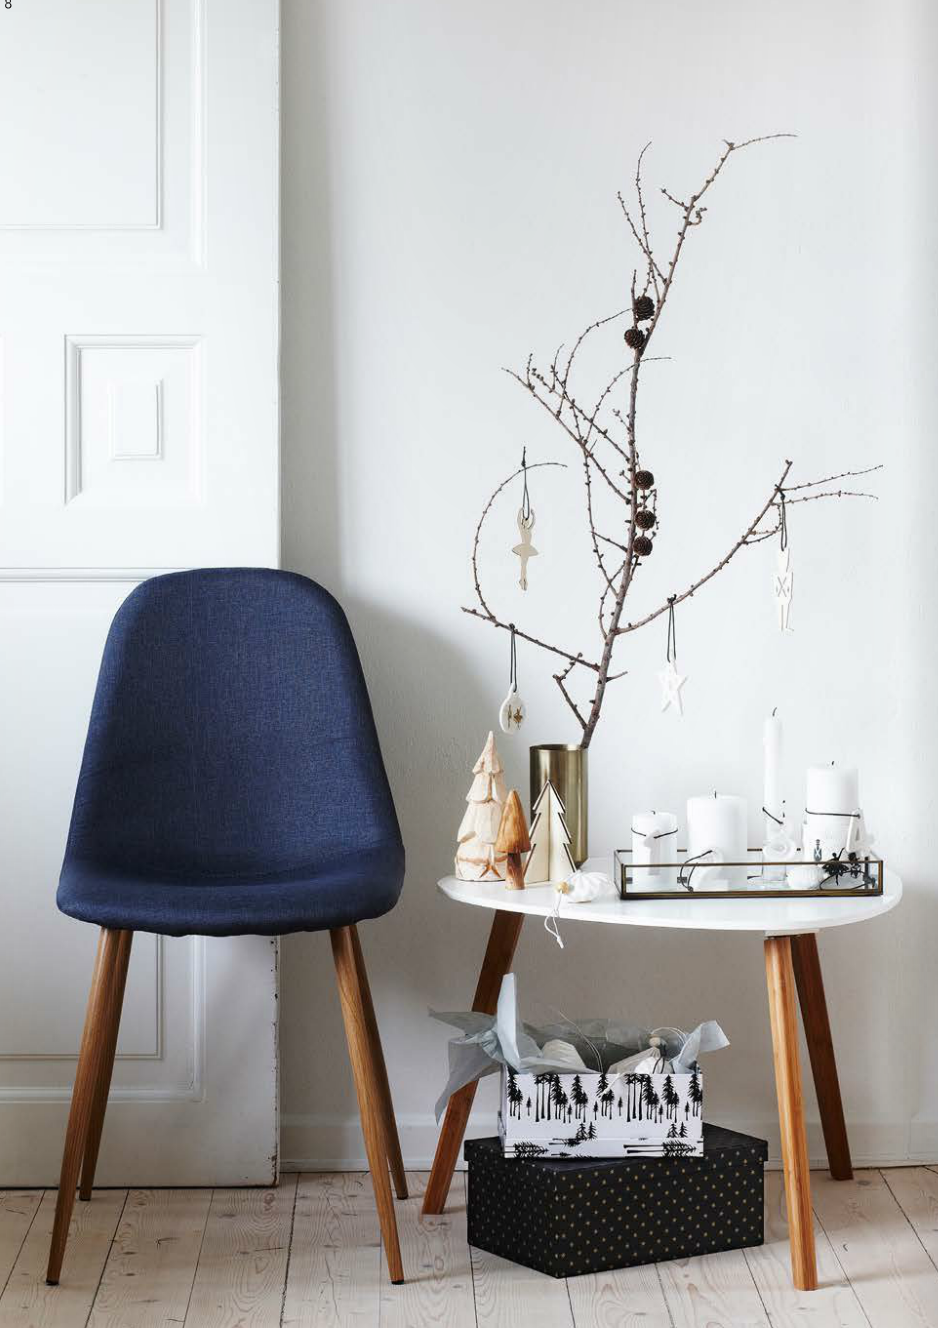 soestrene grene soft christmas in 2019 deco. Black Bedroom Furniture Sets. Home Design Ideas